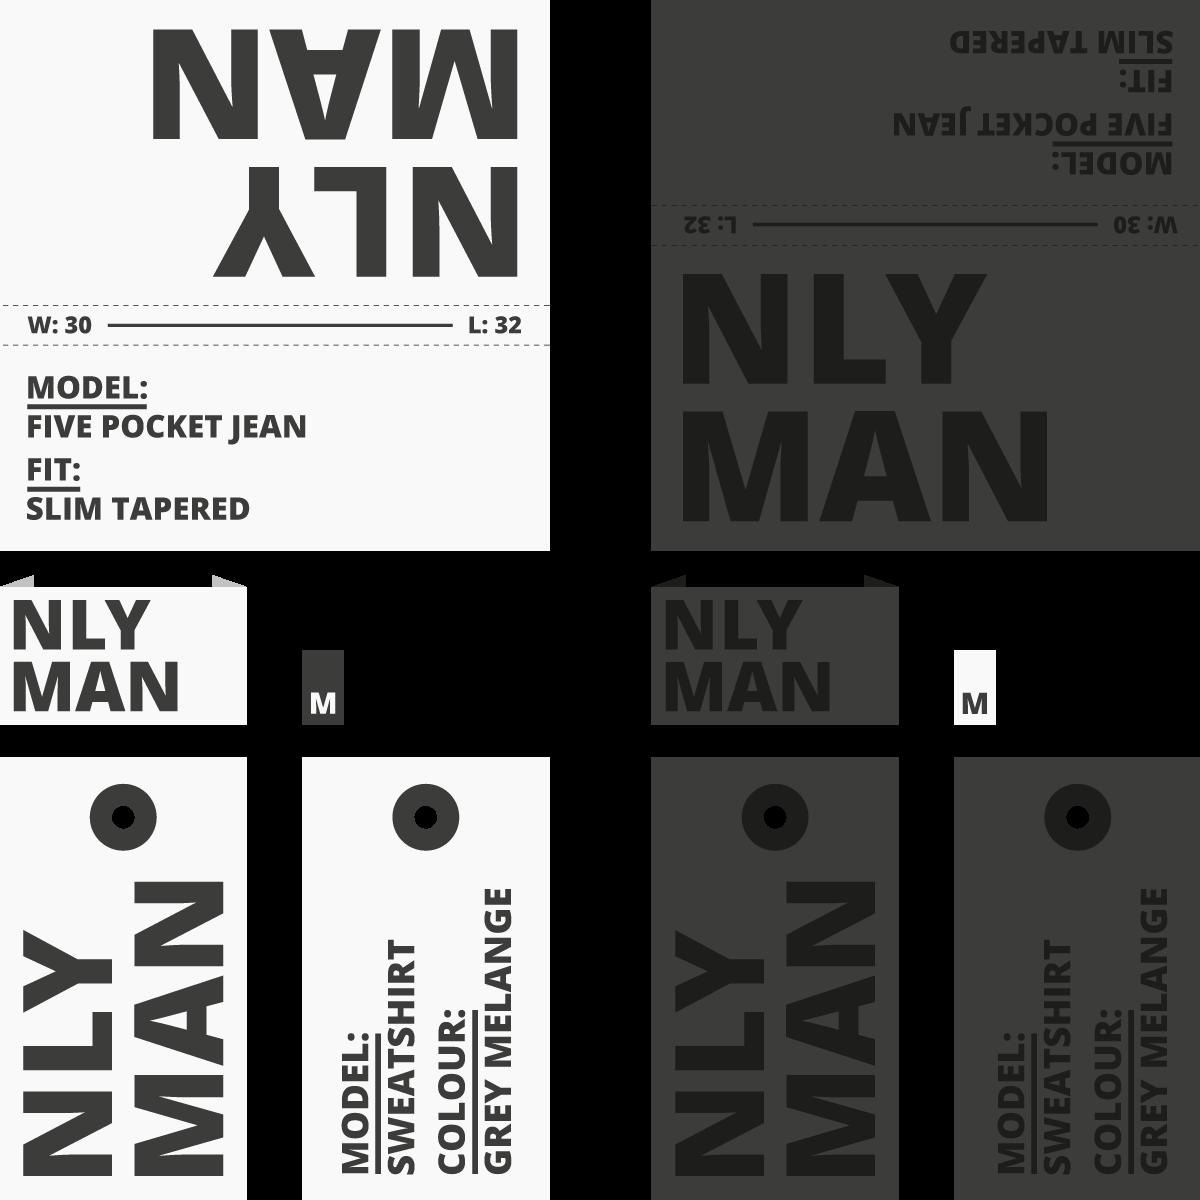 nly-man-etiketter-2.jpg